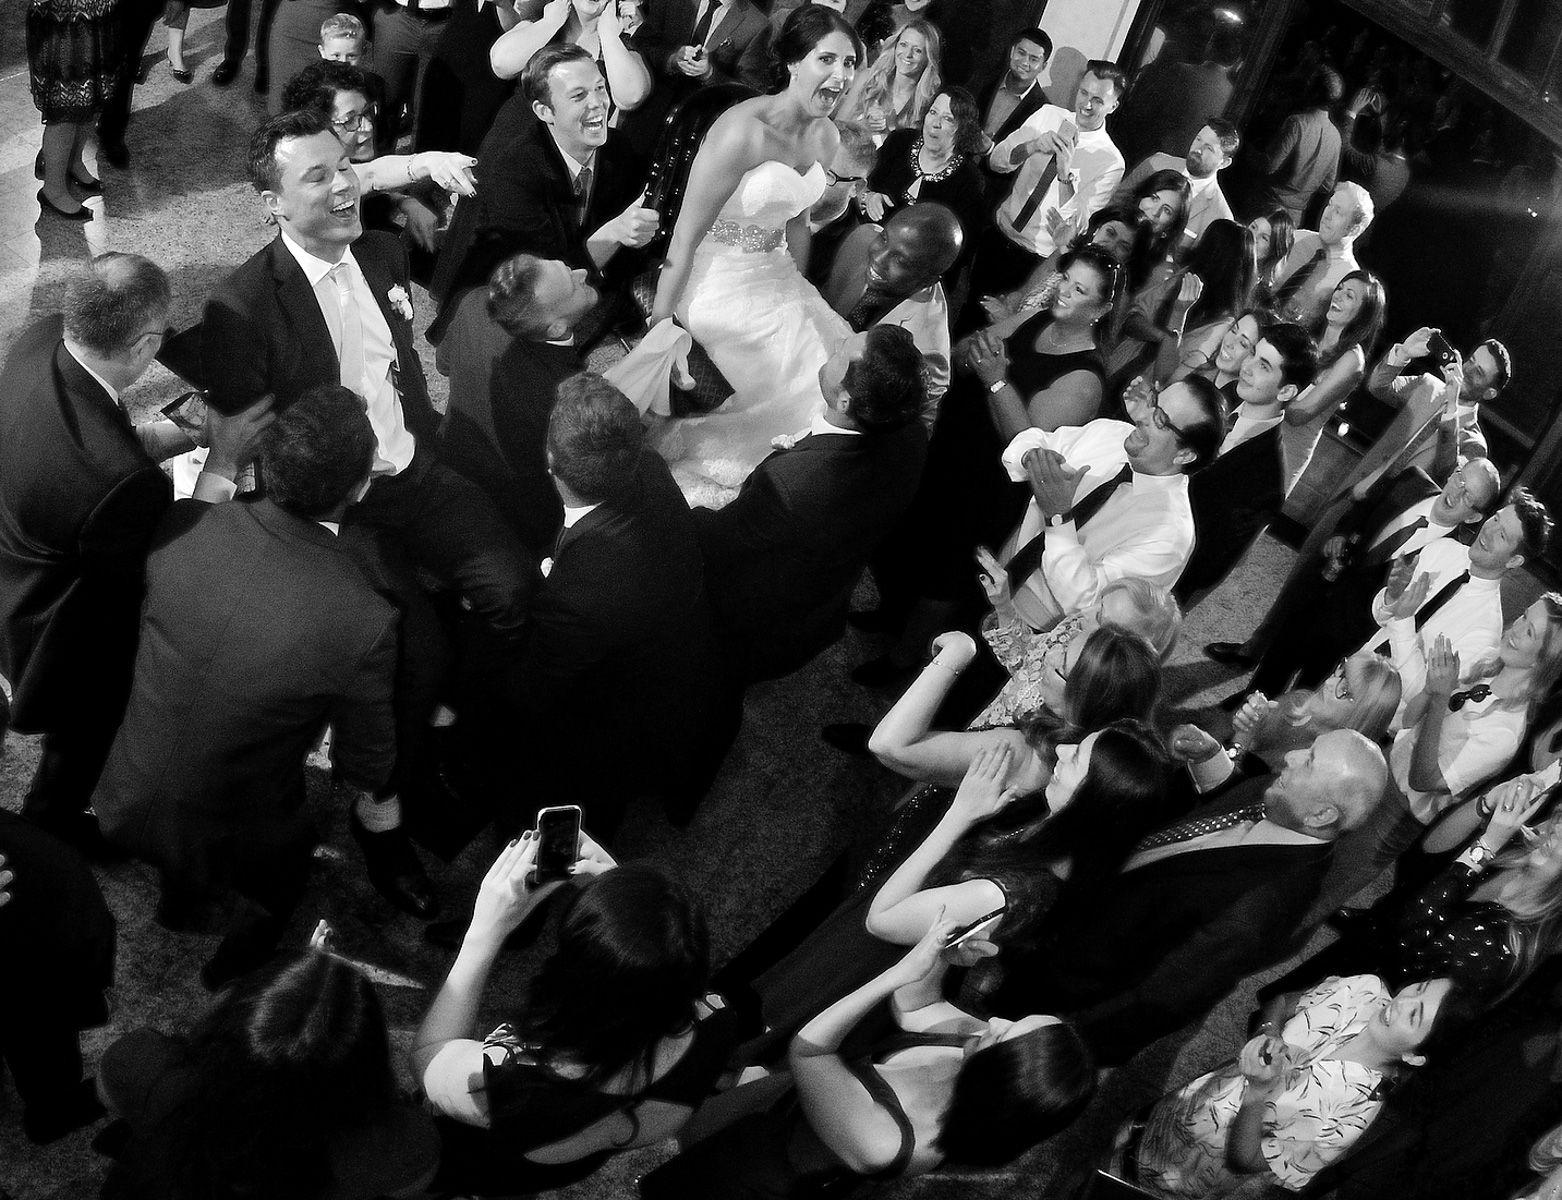 Orthodox Wedding Hora In Black and White